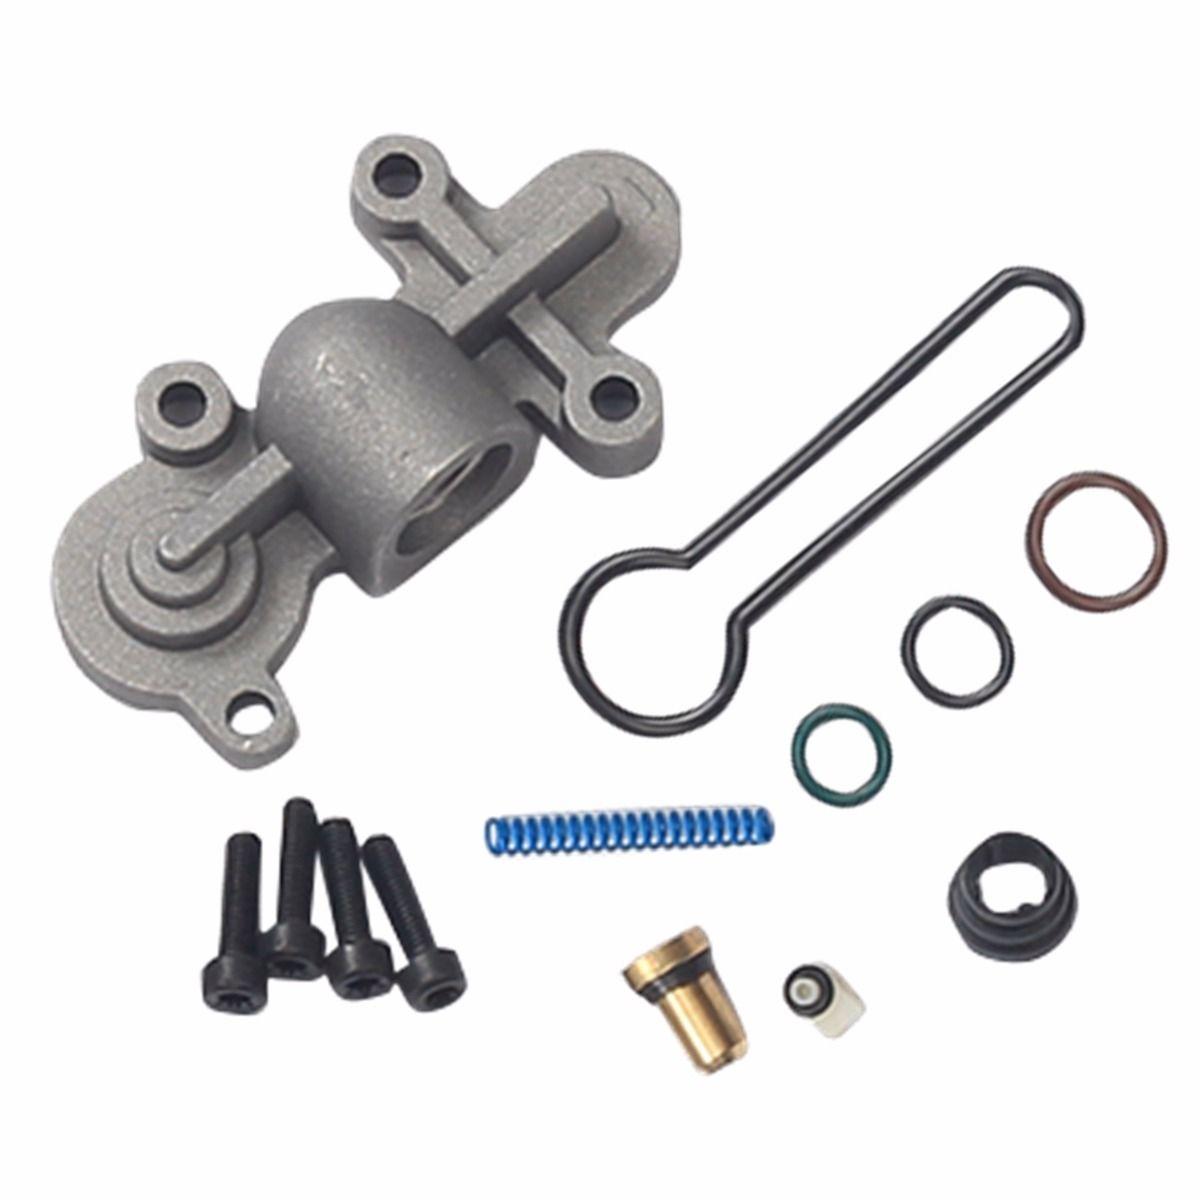 Fuel Pressure Regulator Blue Spring Upgrade Kit For 03-07 Ford 6 0L  Powerstroke zx15116